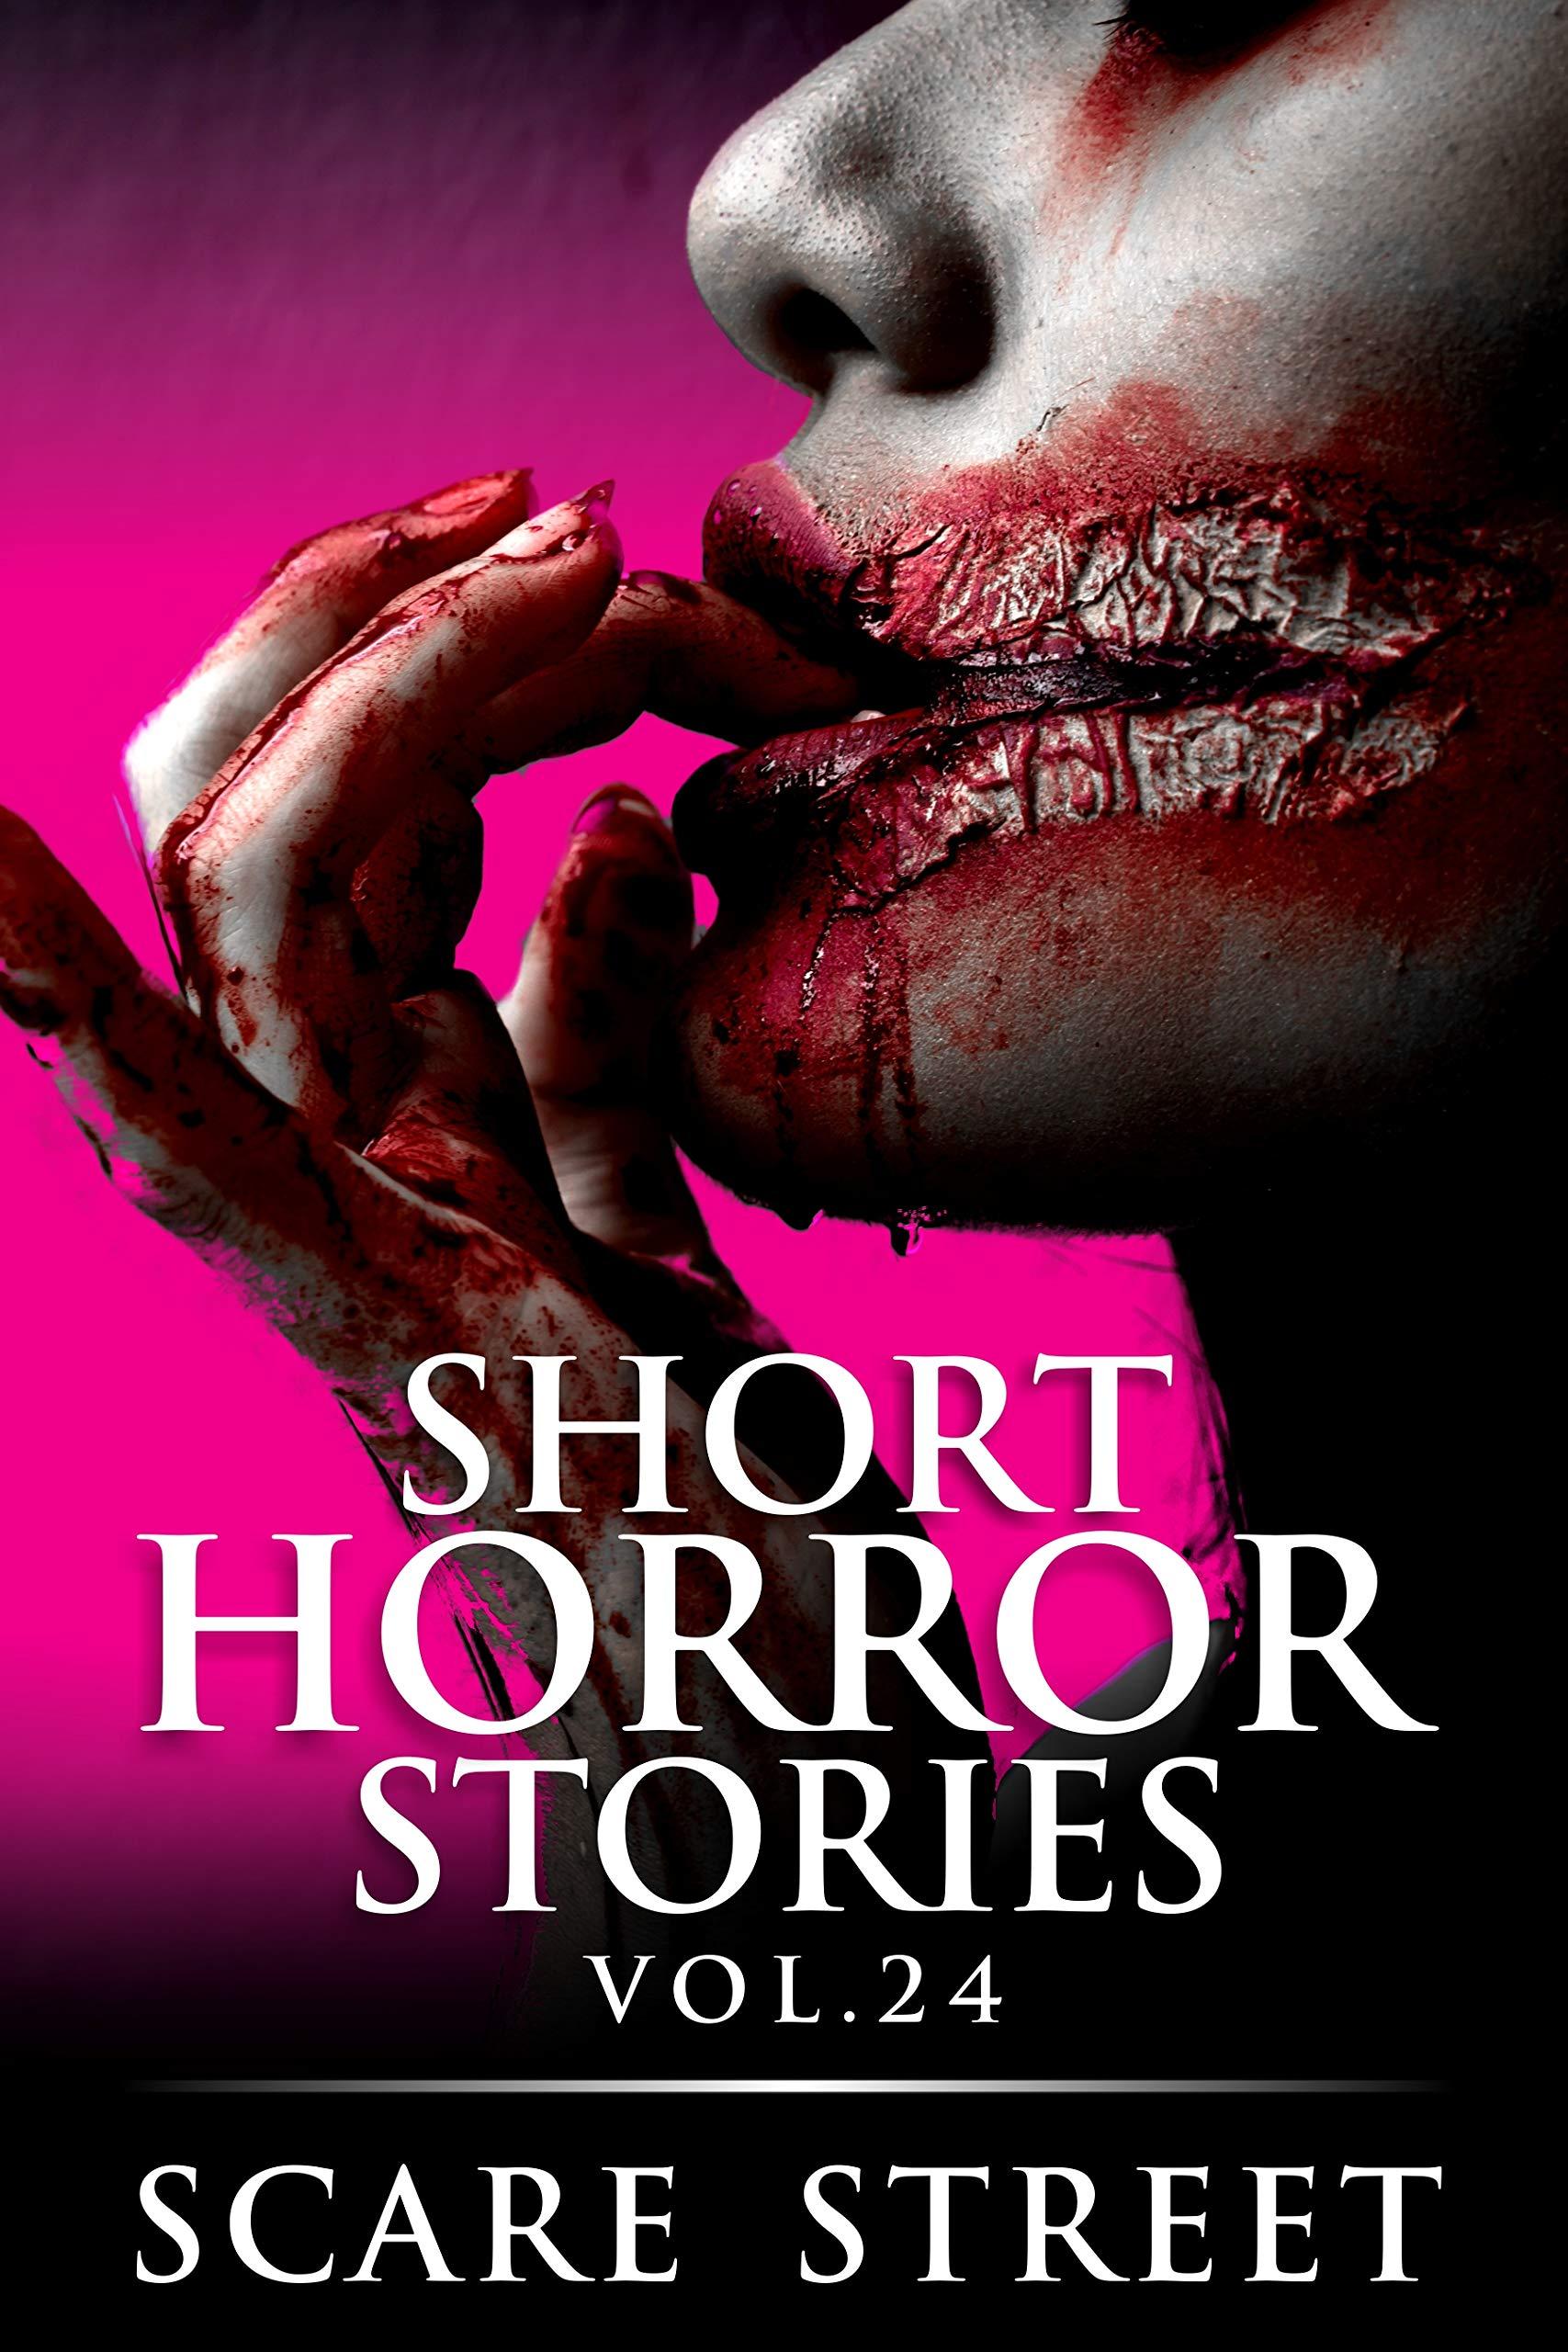 Short Horror Stories Vol. 24